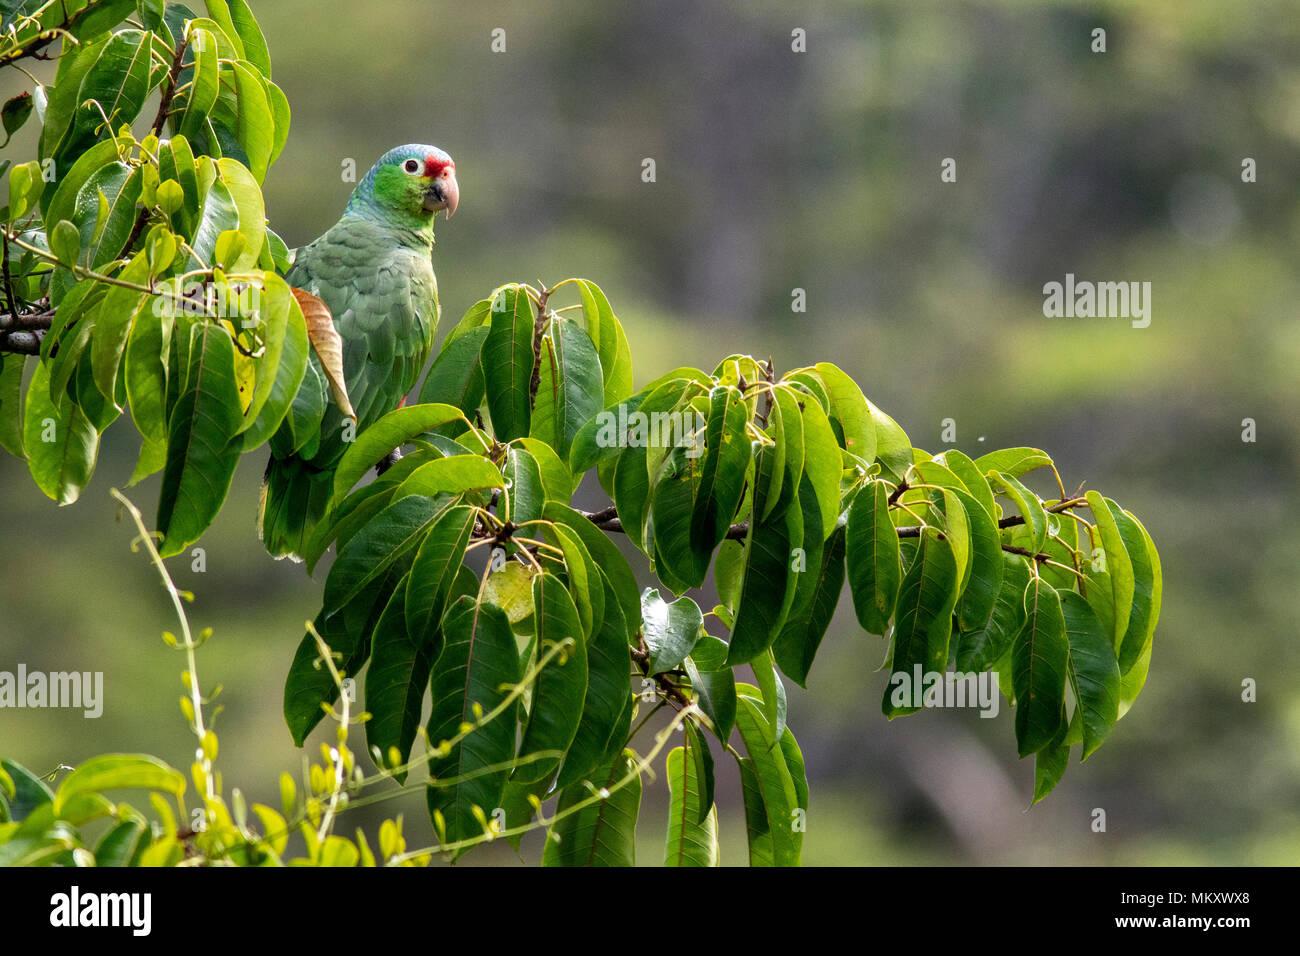 Red-lored Parrot or Red-lored Amazon Parrot - Laguna del Lagarto Lodge, Boca Tapada, San Carlos, Costa Rica - Stock Image